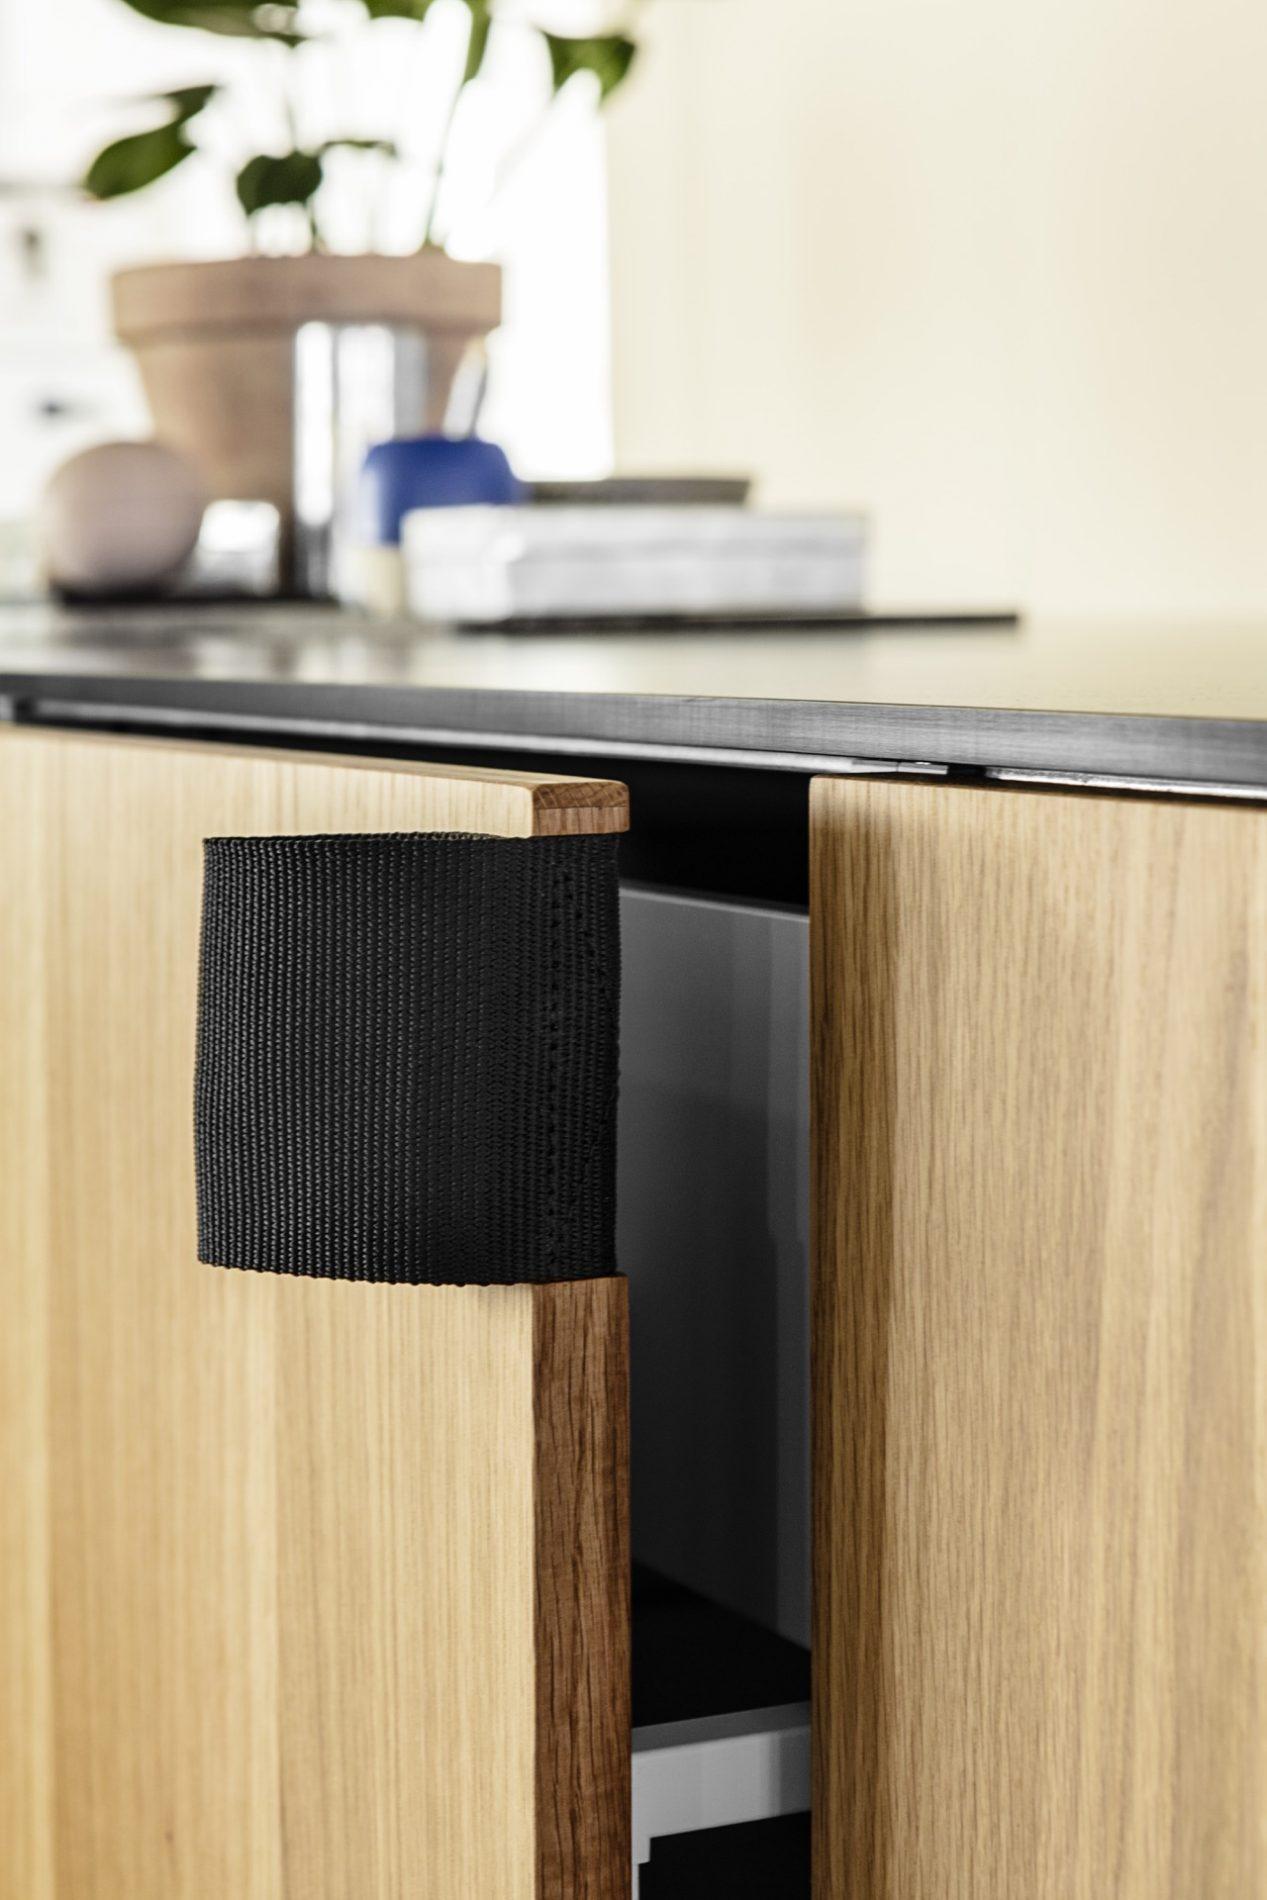 IKEA KITCHEN HACK REFORM Italianbark Interiordesignblog (33)